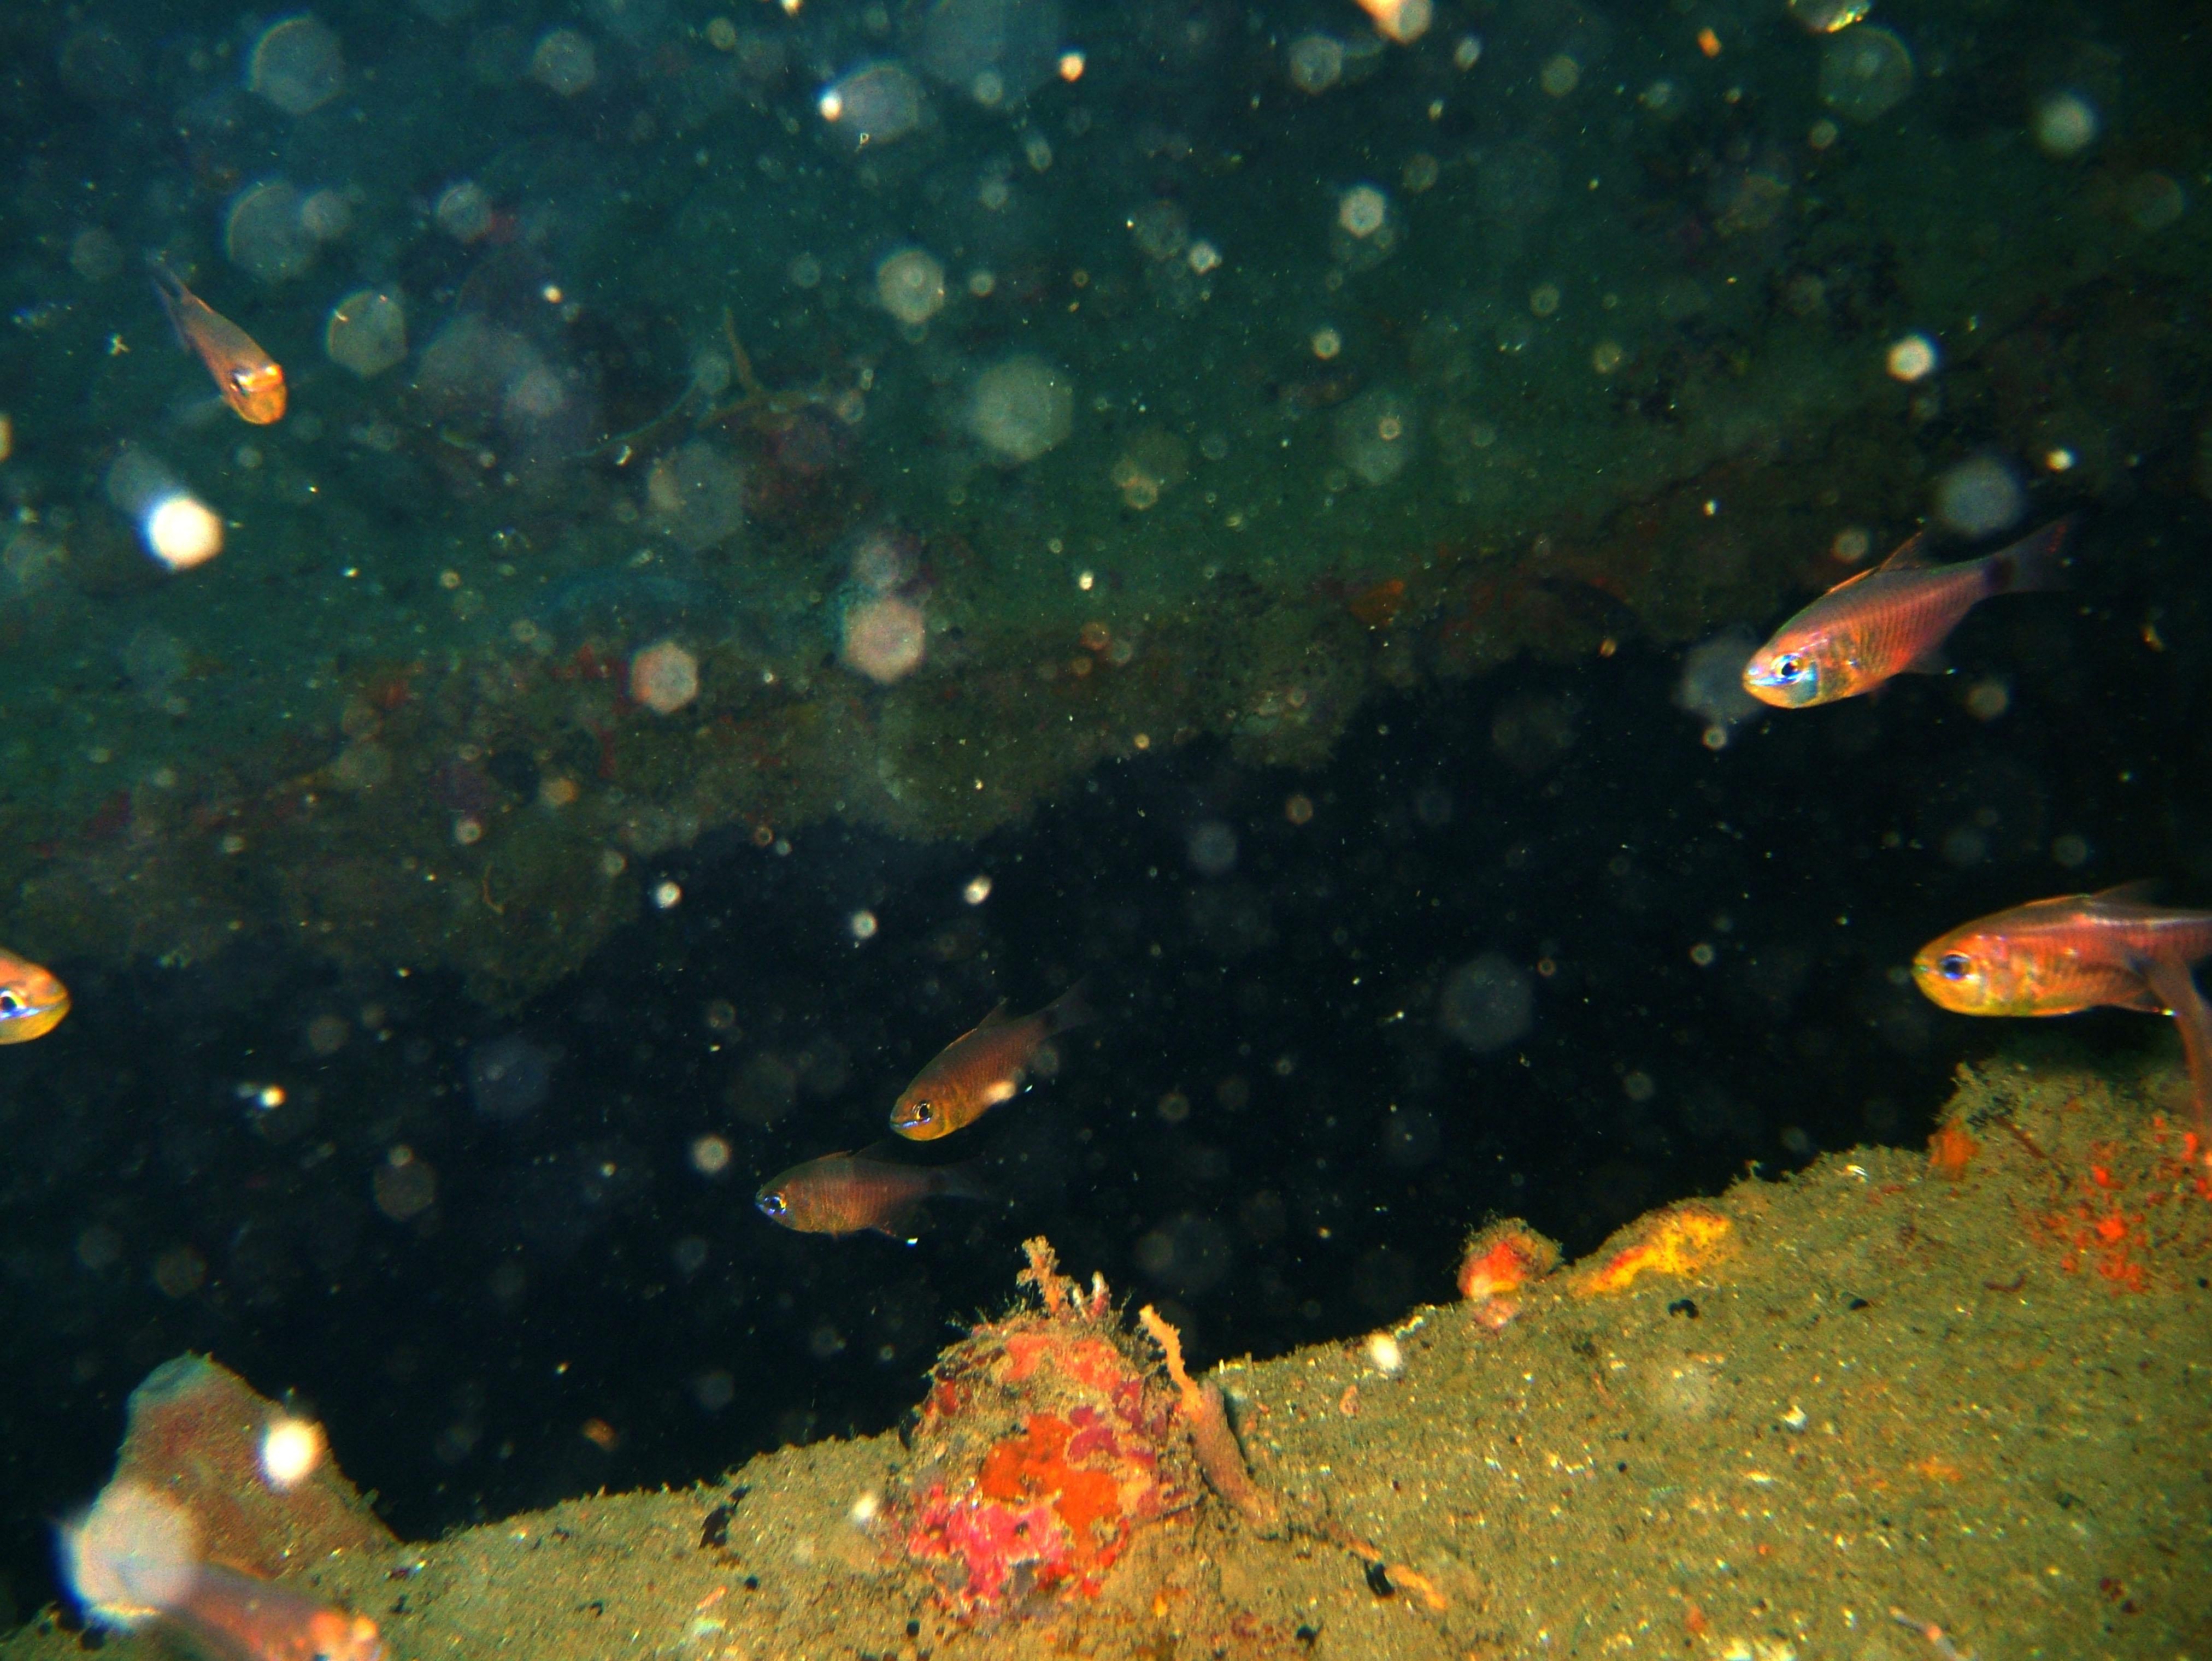 Coron dive site 8 Wreck dive IJN Olympia Maru July 2005 12